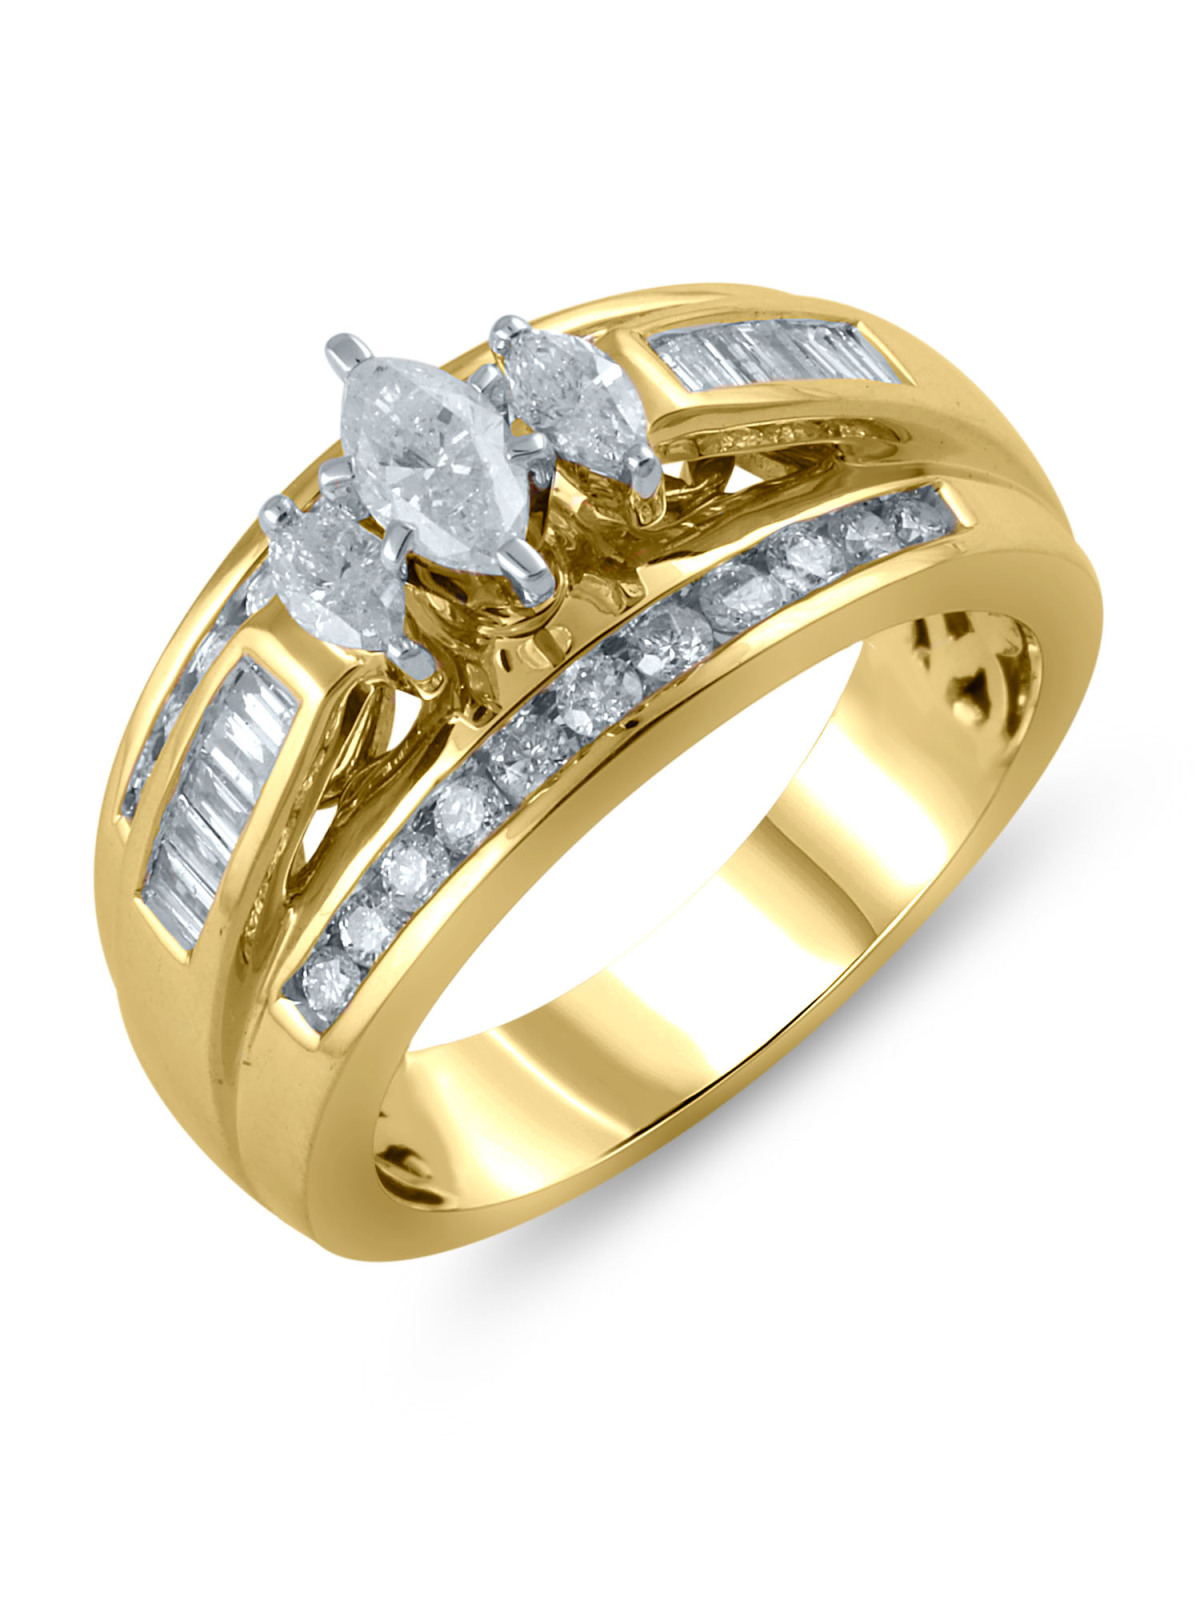 14K Yellow Gold 1 Carat Total Weight Genuine Diamond 3 Marquise Ring Set